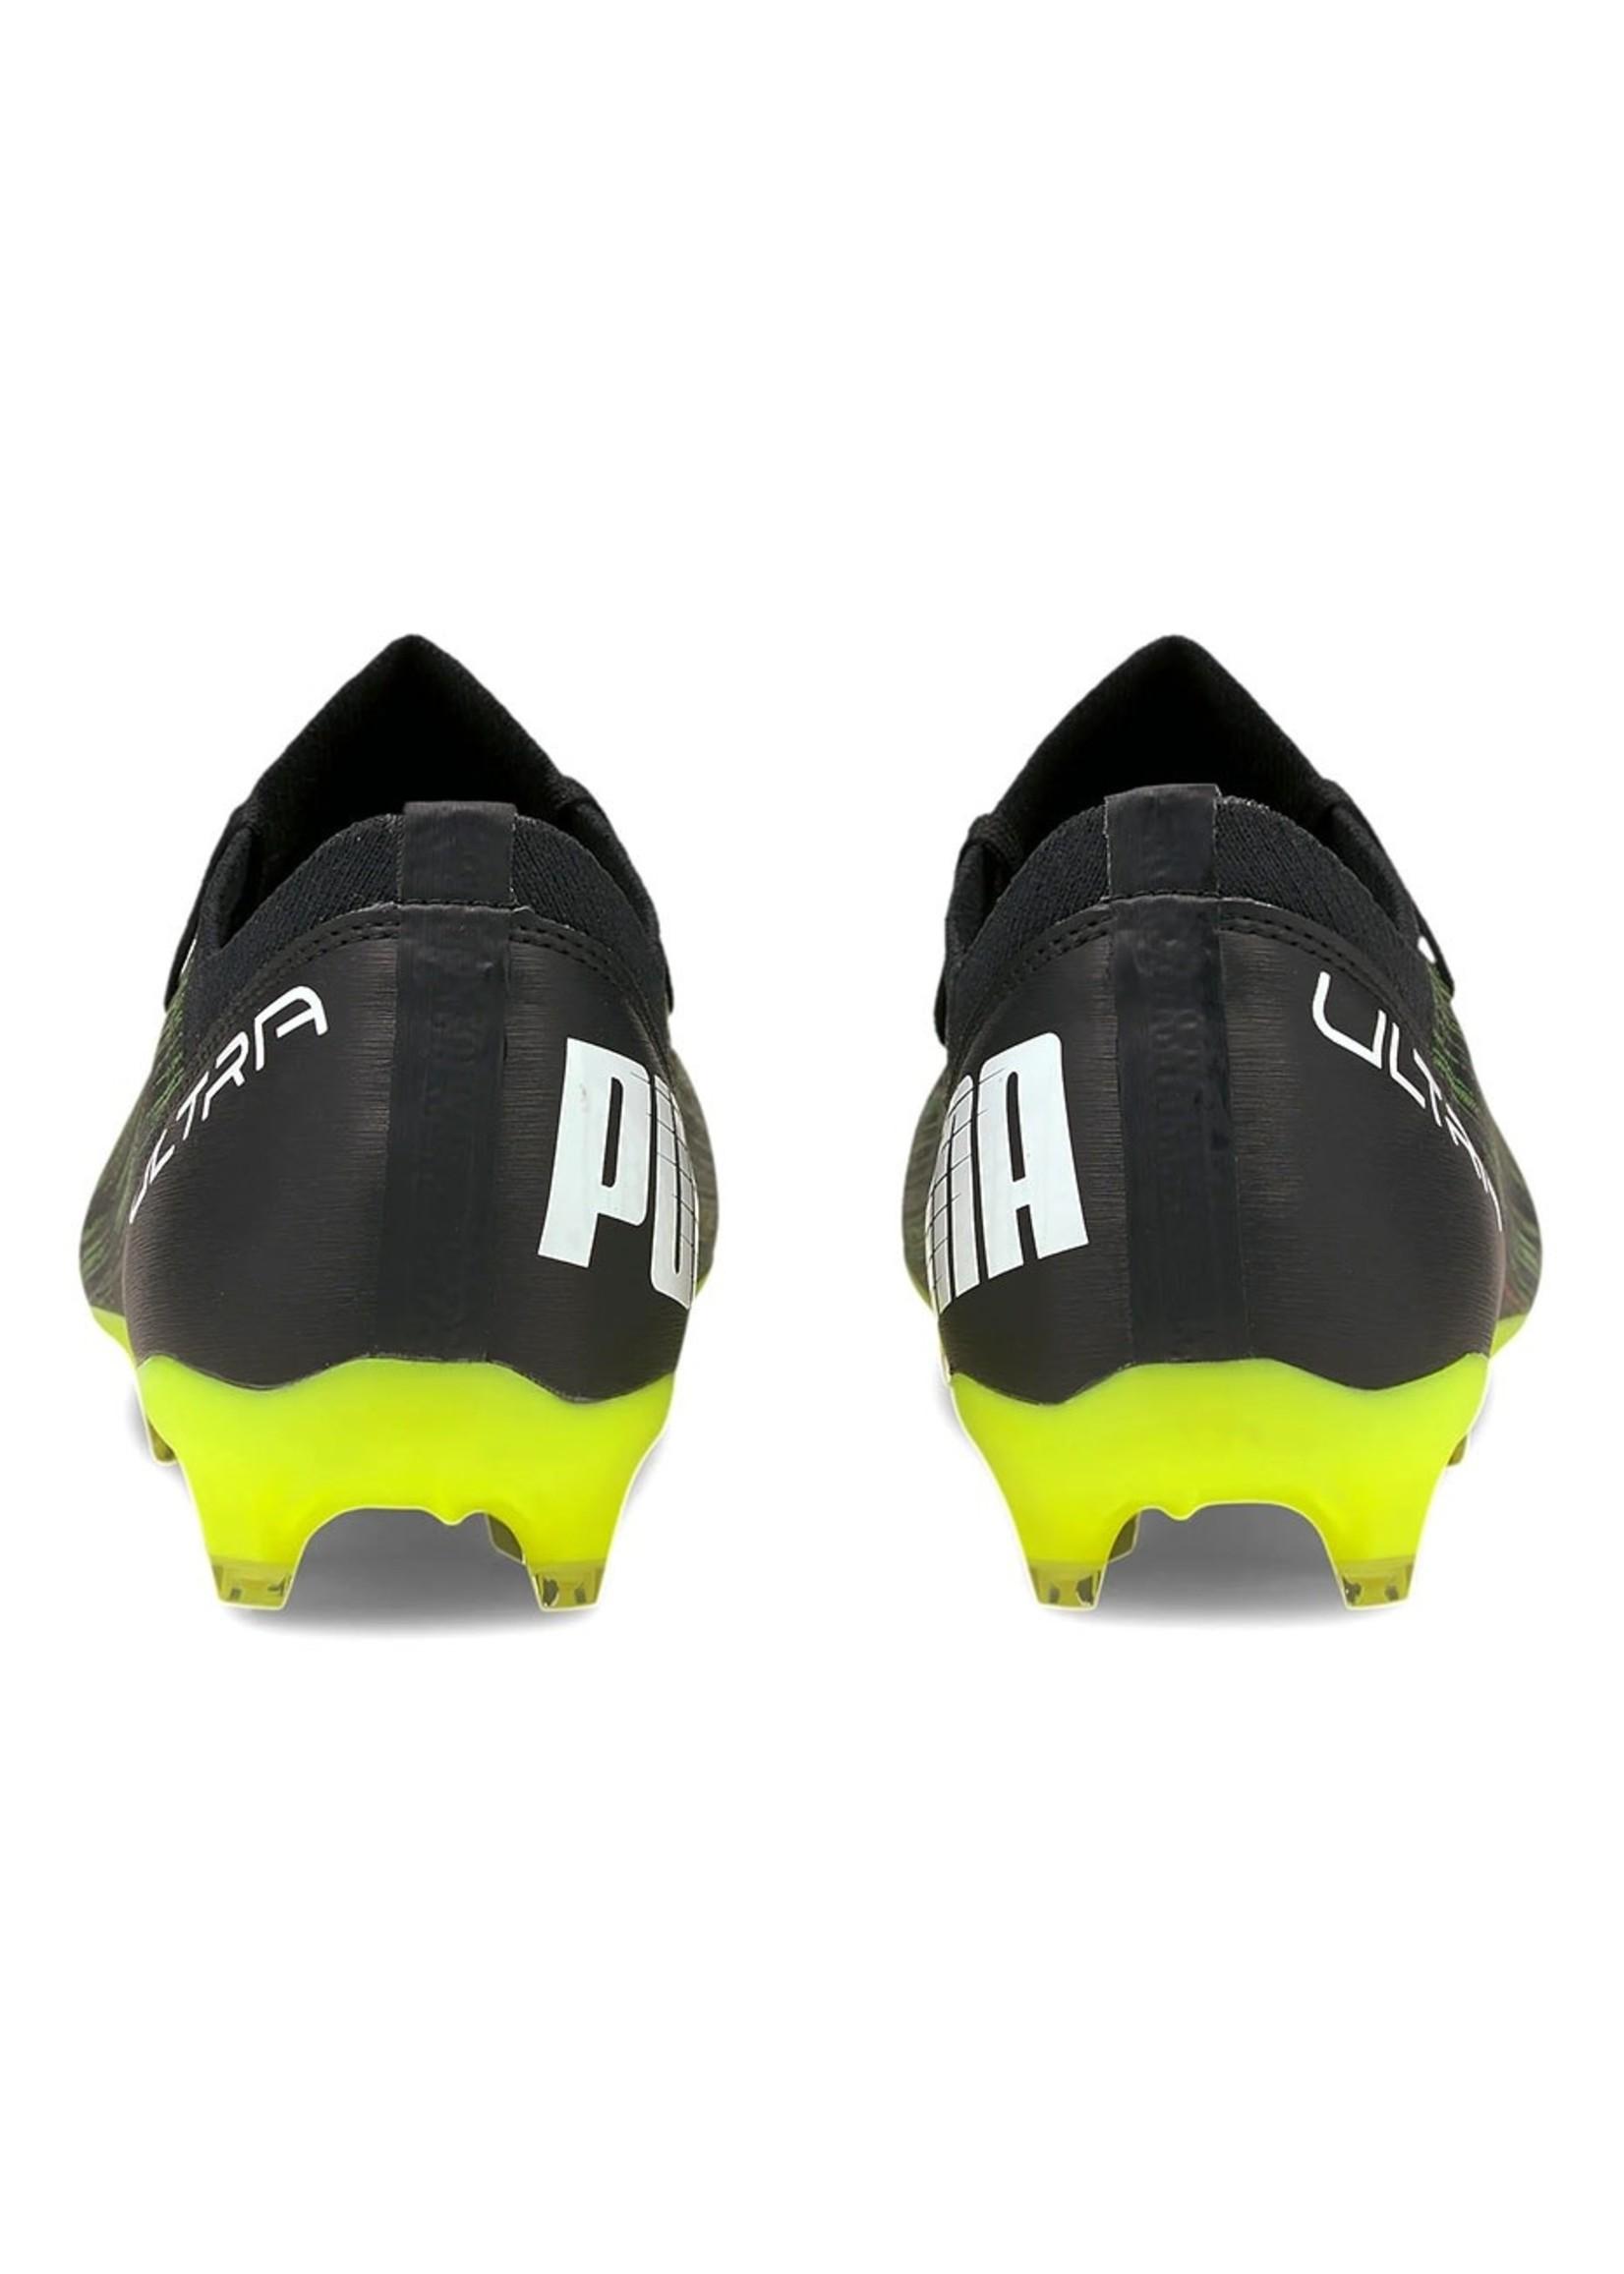 Puma ULTRA 3.2 FG/AG